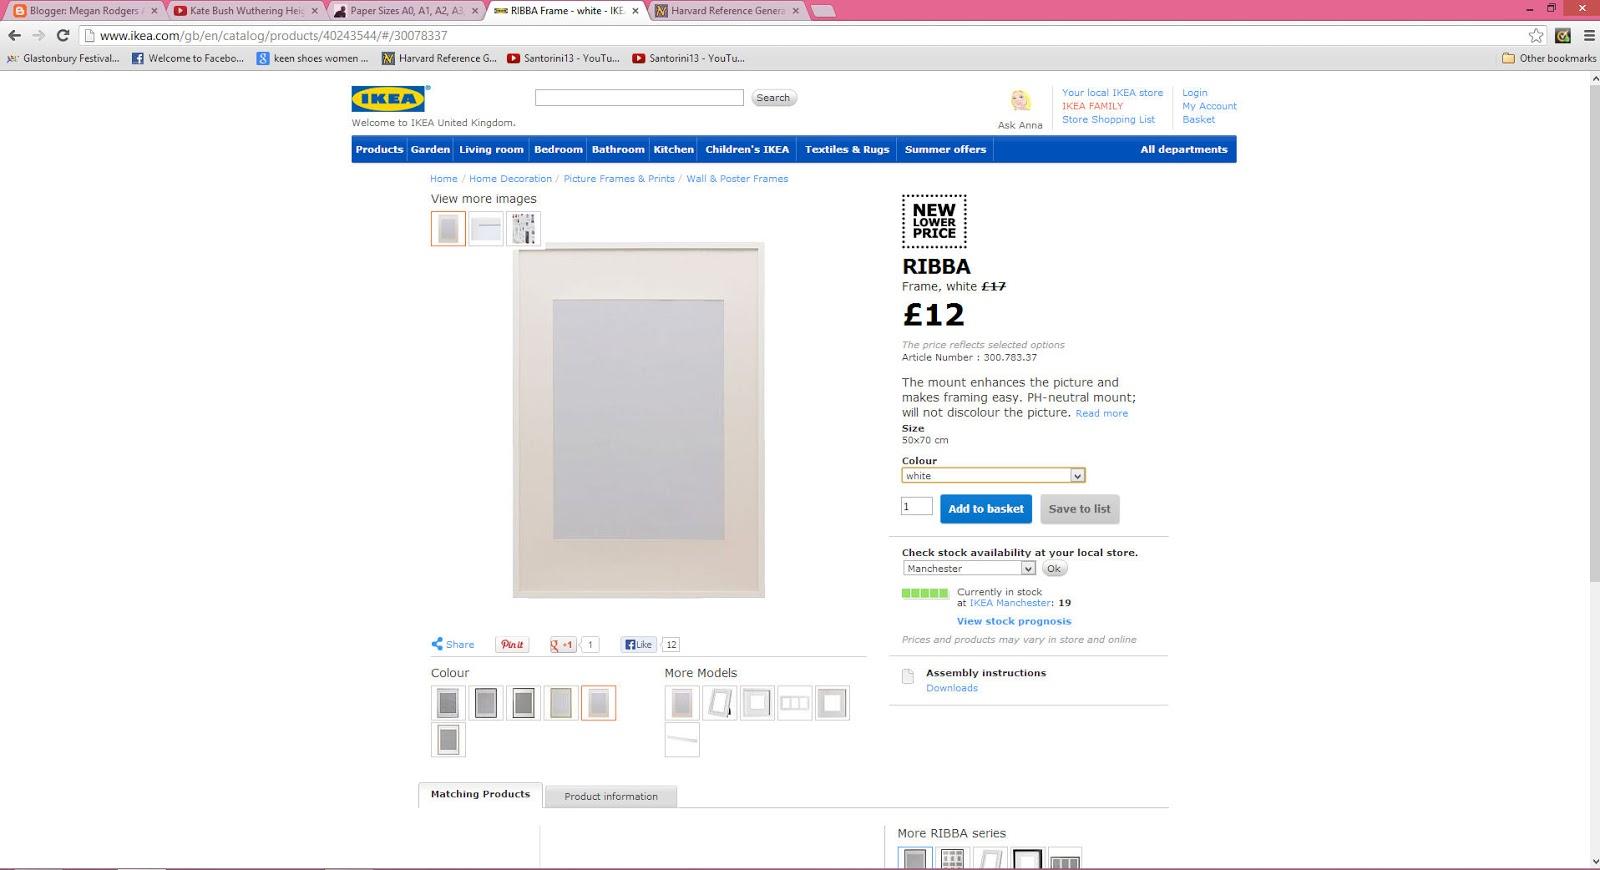 Megan Rodgers Art Blog: IKEA RIBBA Frames series